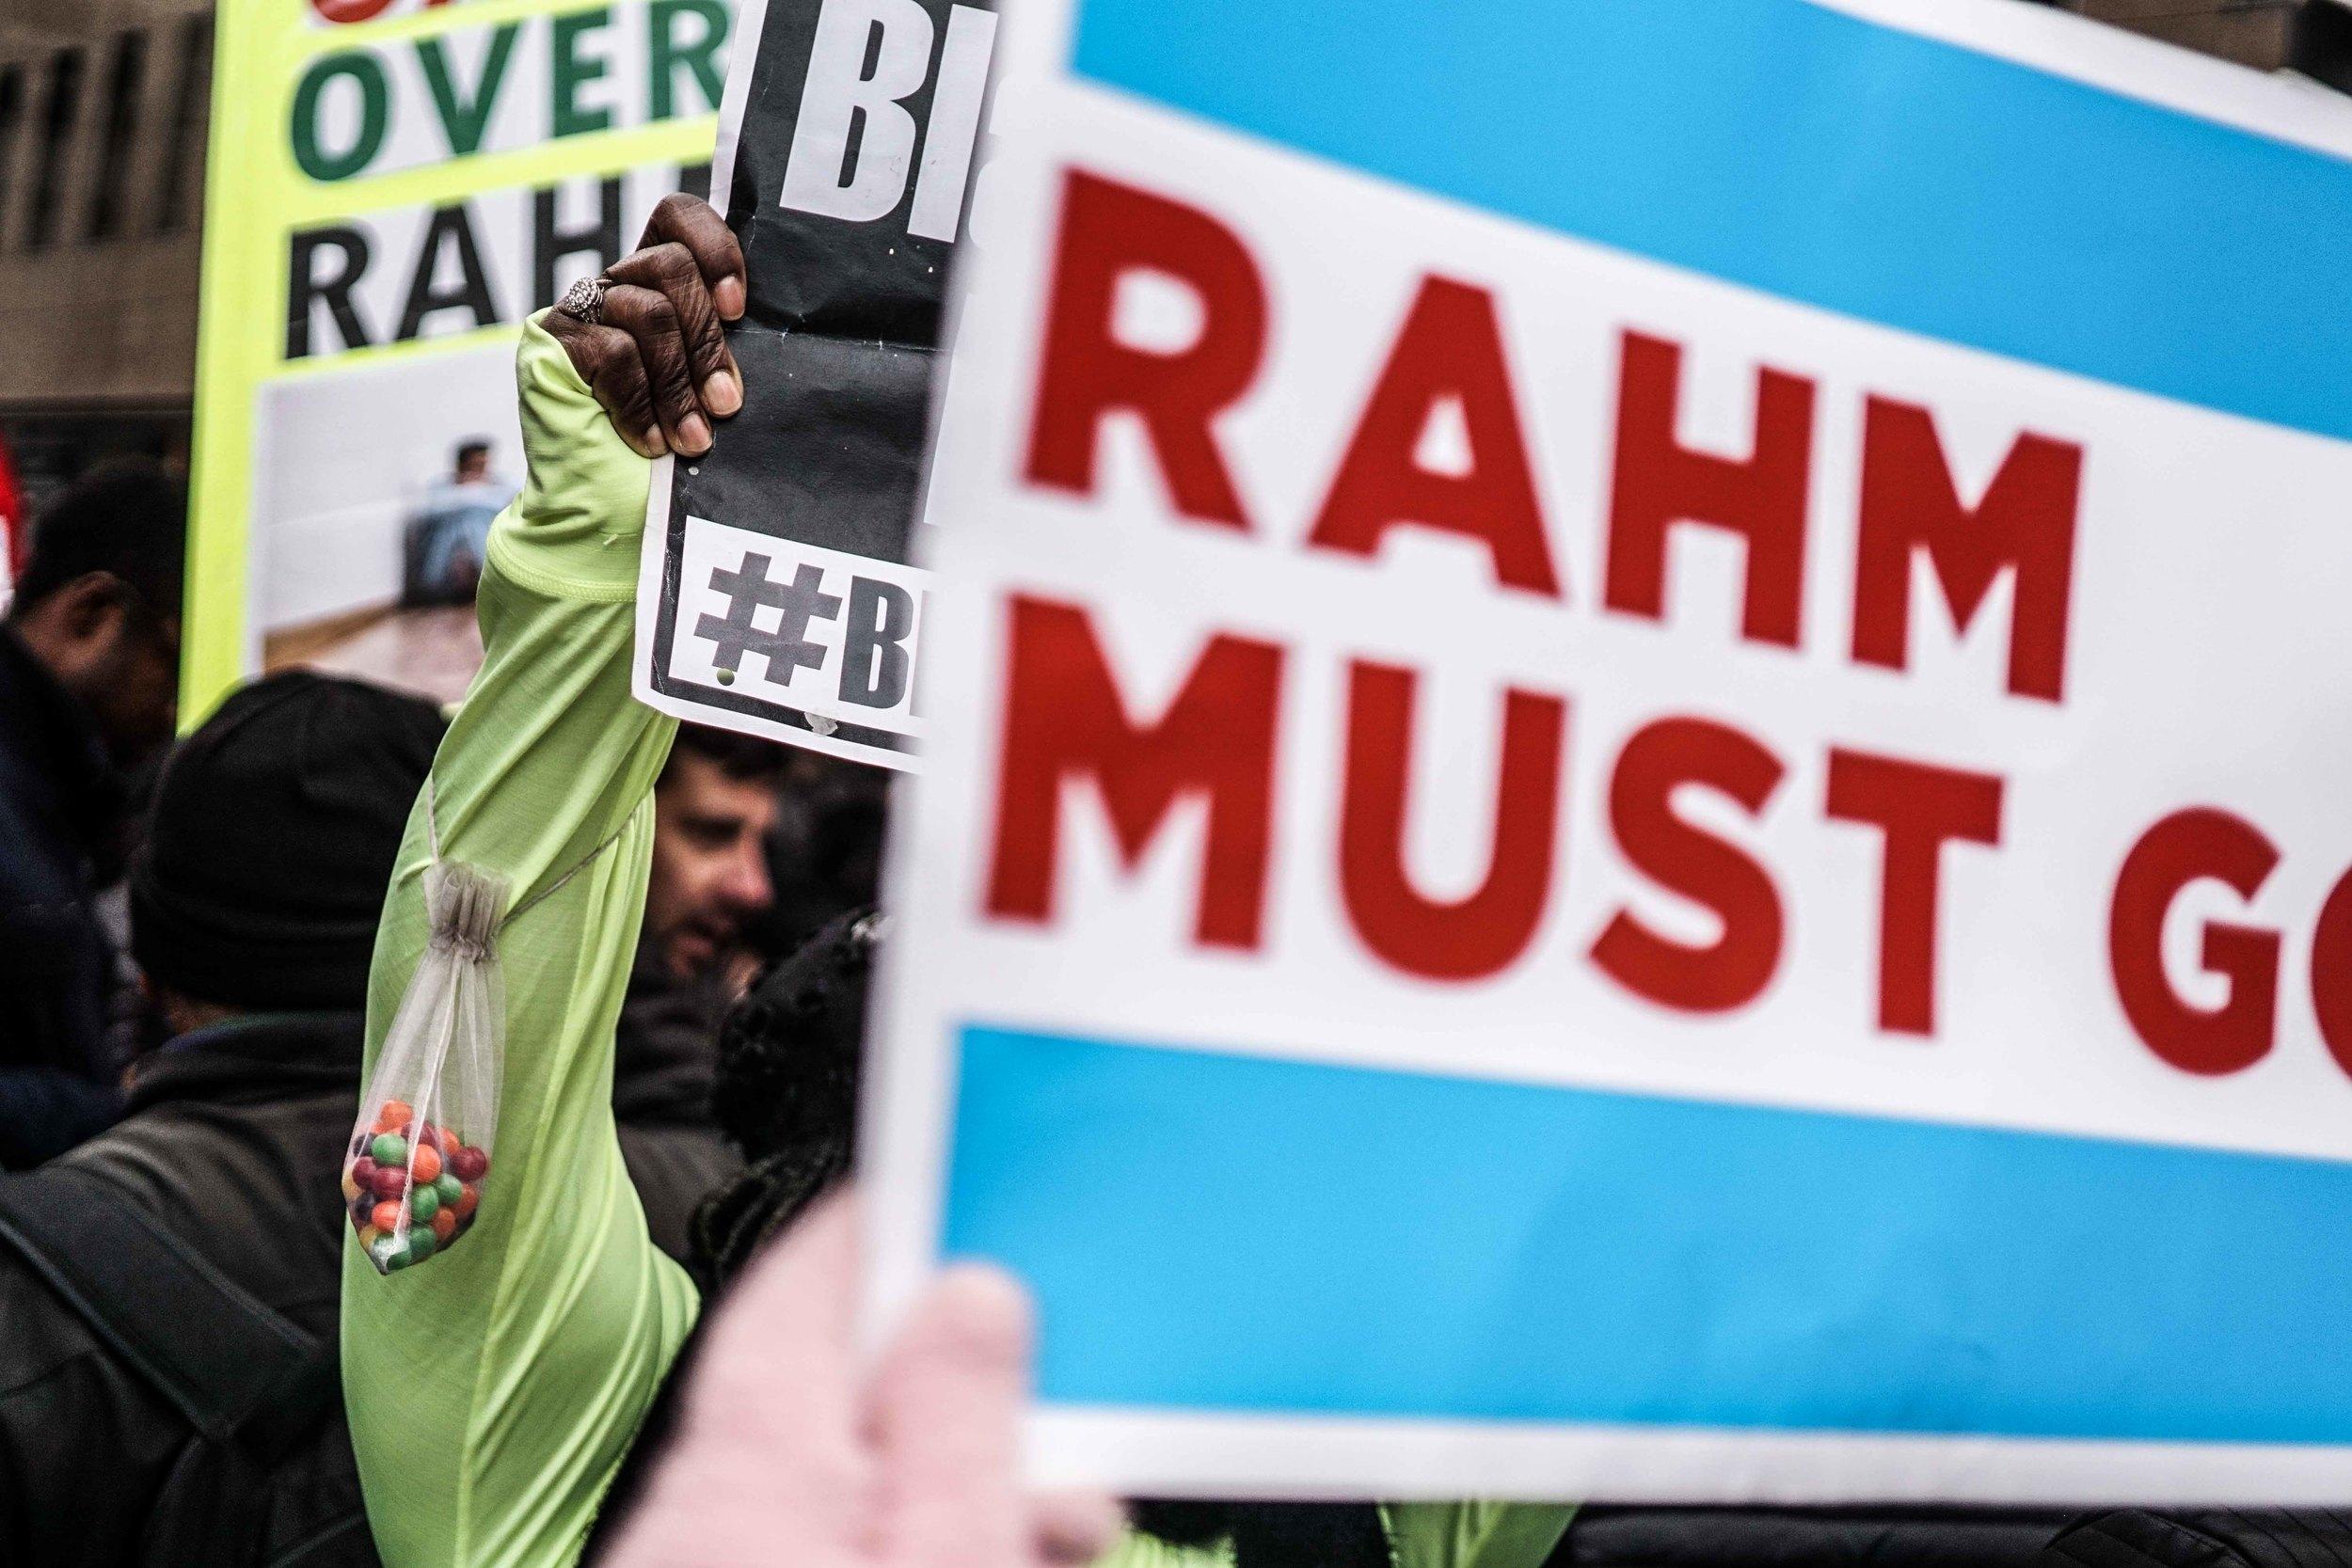 Laquan Mcdonald Protest Resign Rahm Christmas Eve December 2015 Harrison Bruhn 31.jpg